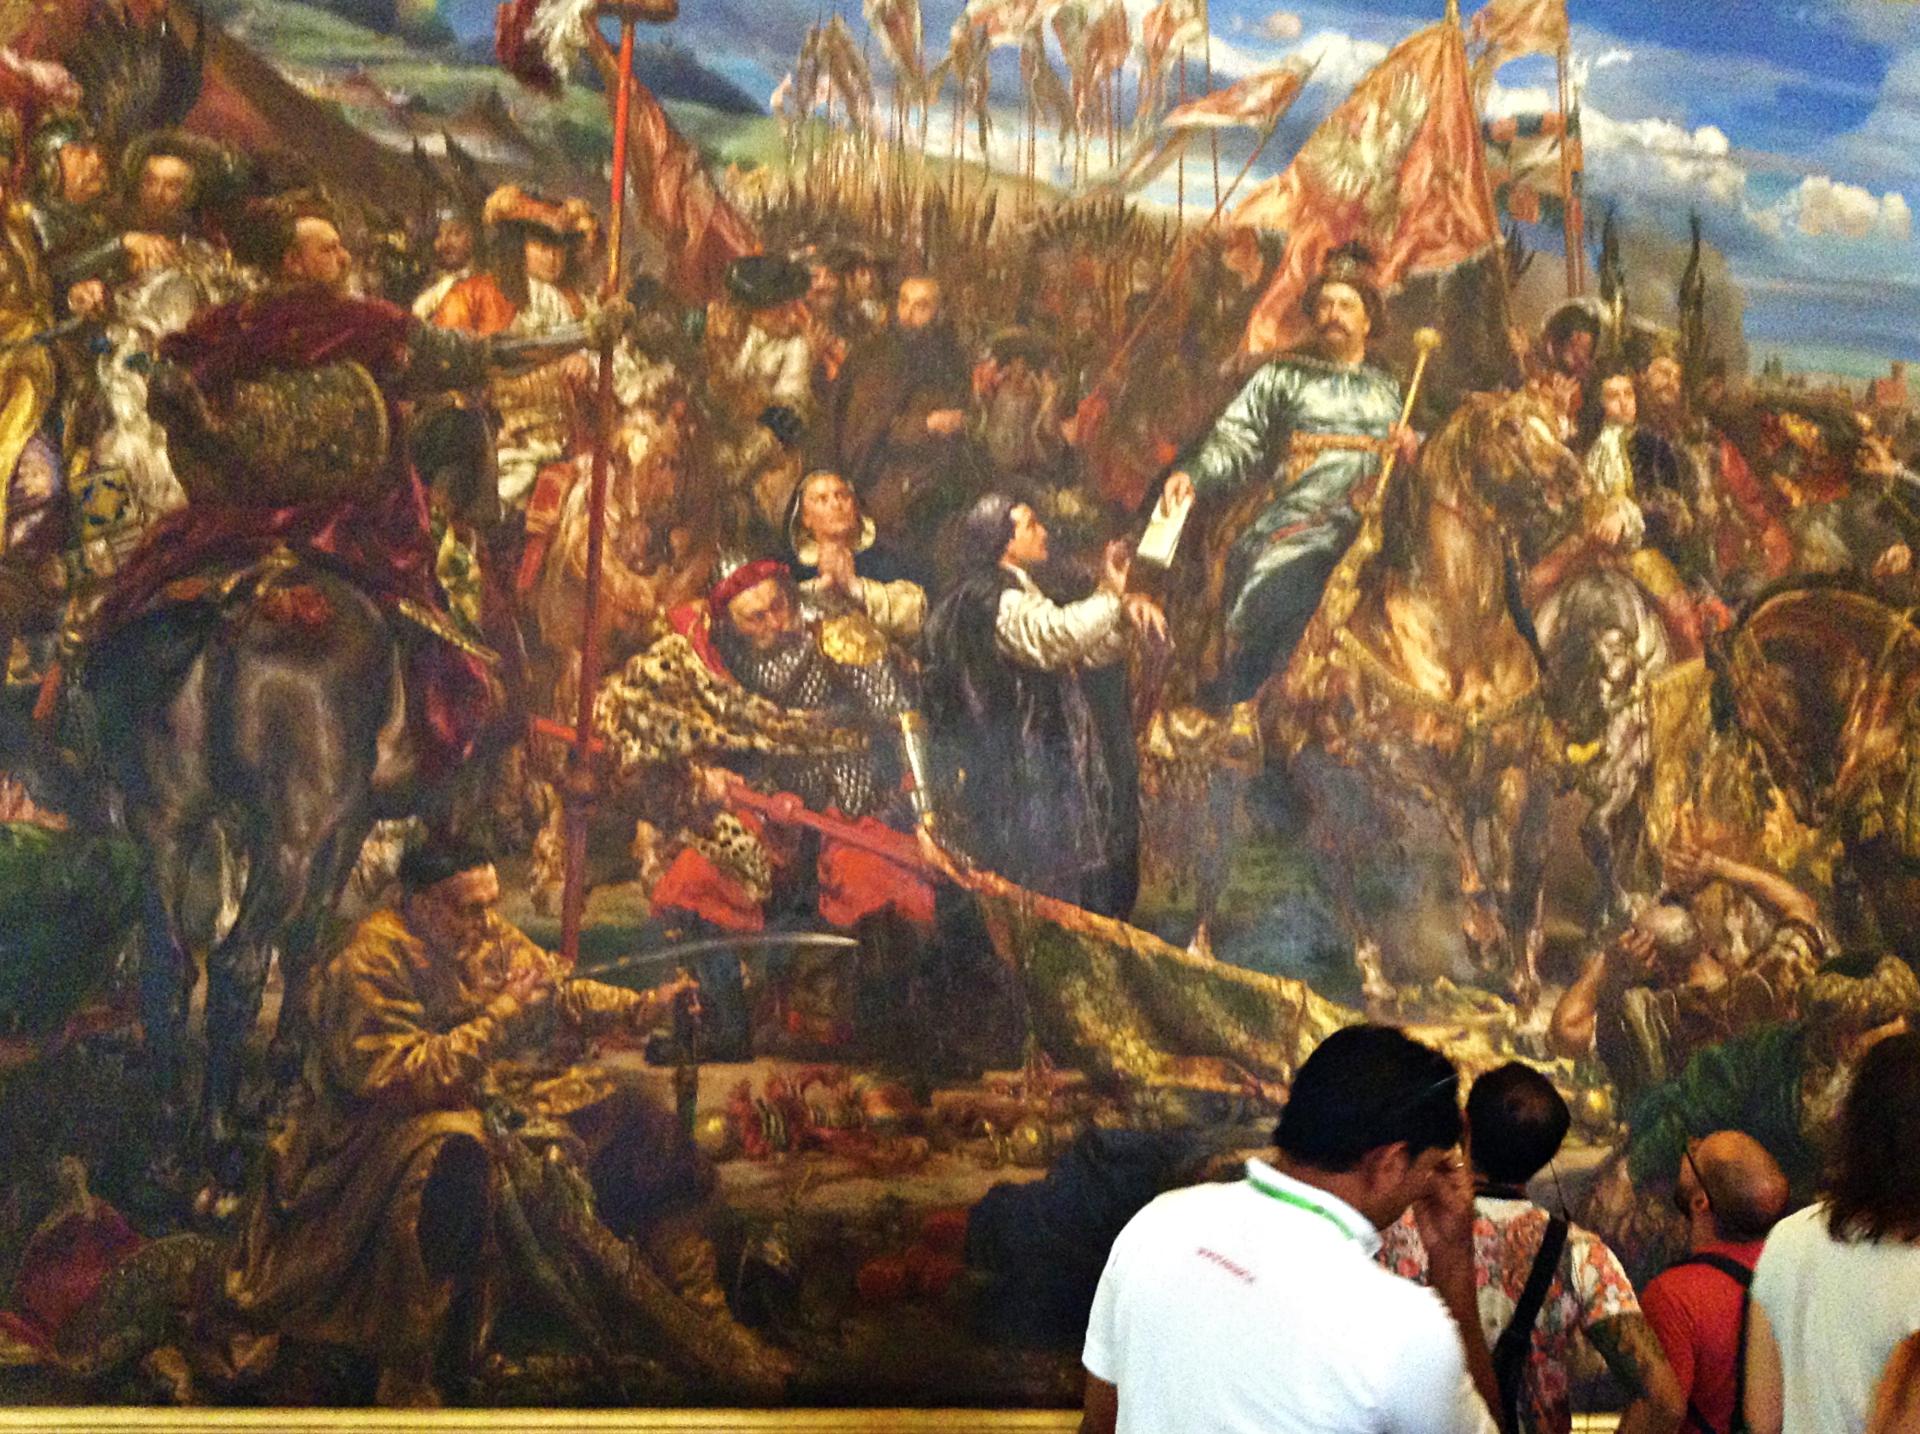 Vatican Museum first visit